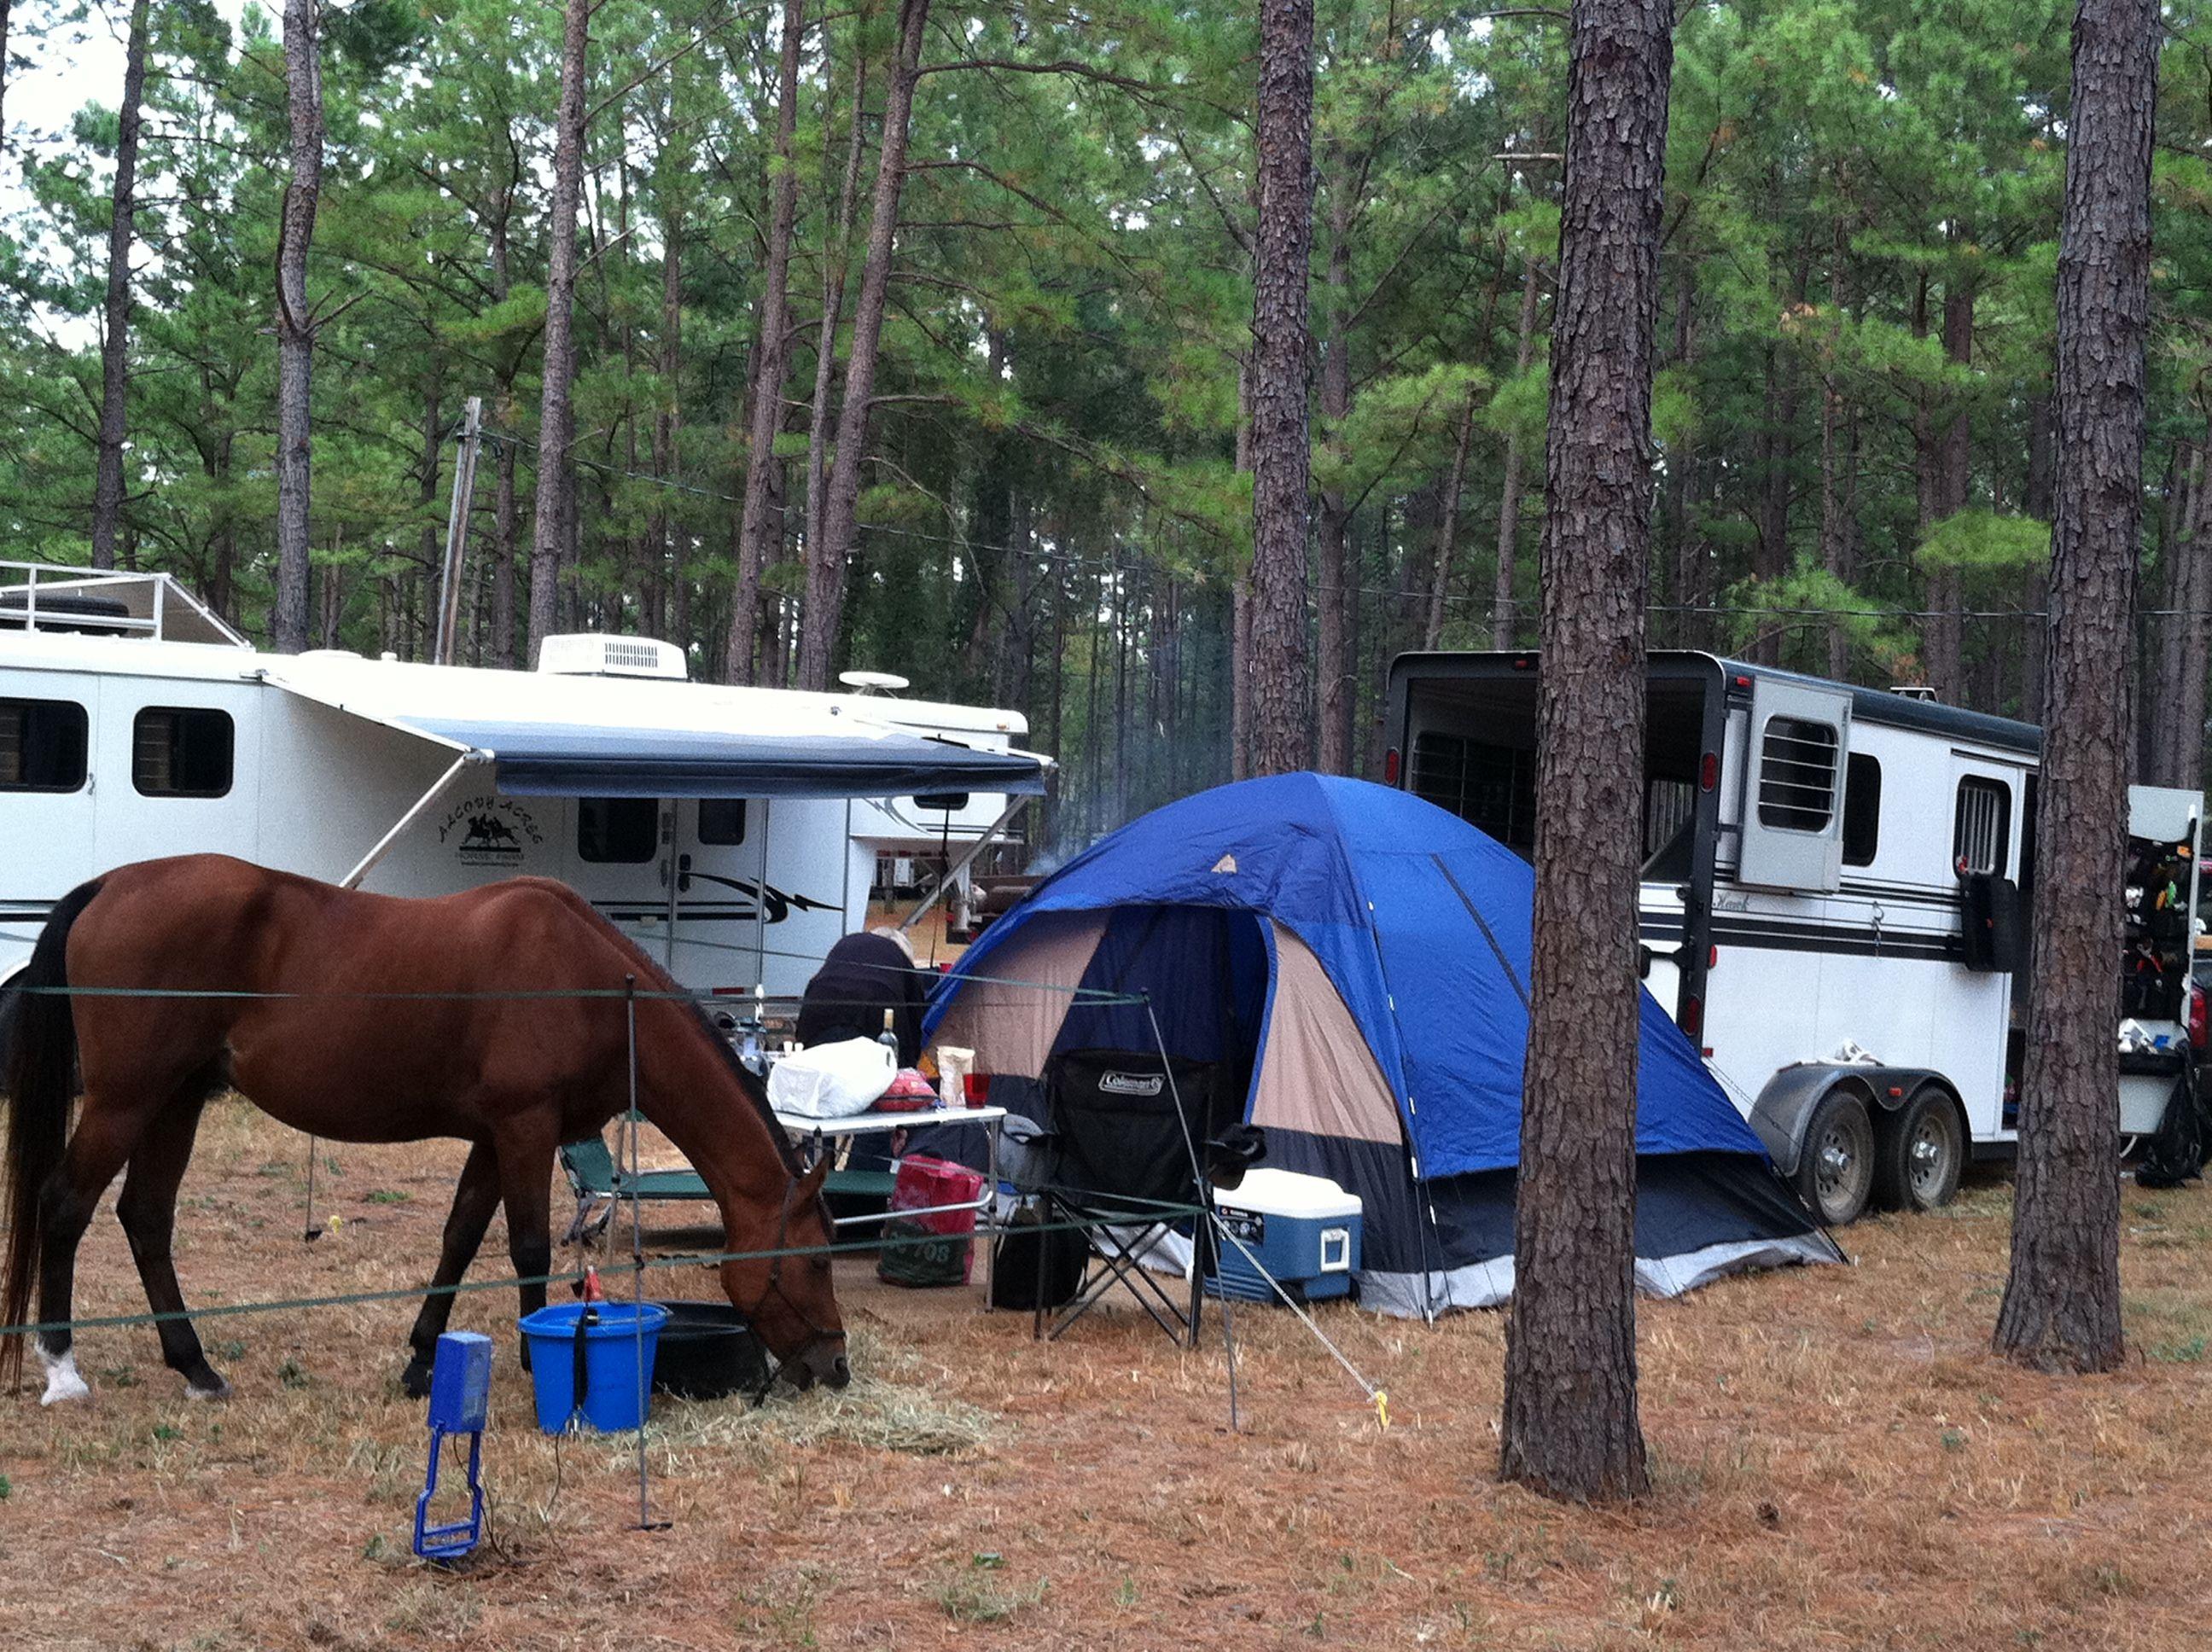 Horse camping | Horse Stuff | Pinterest